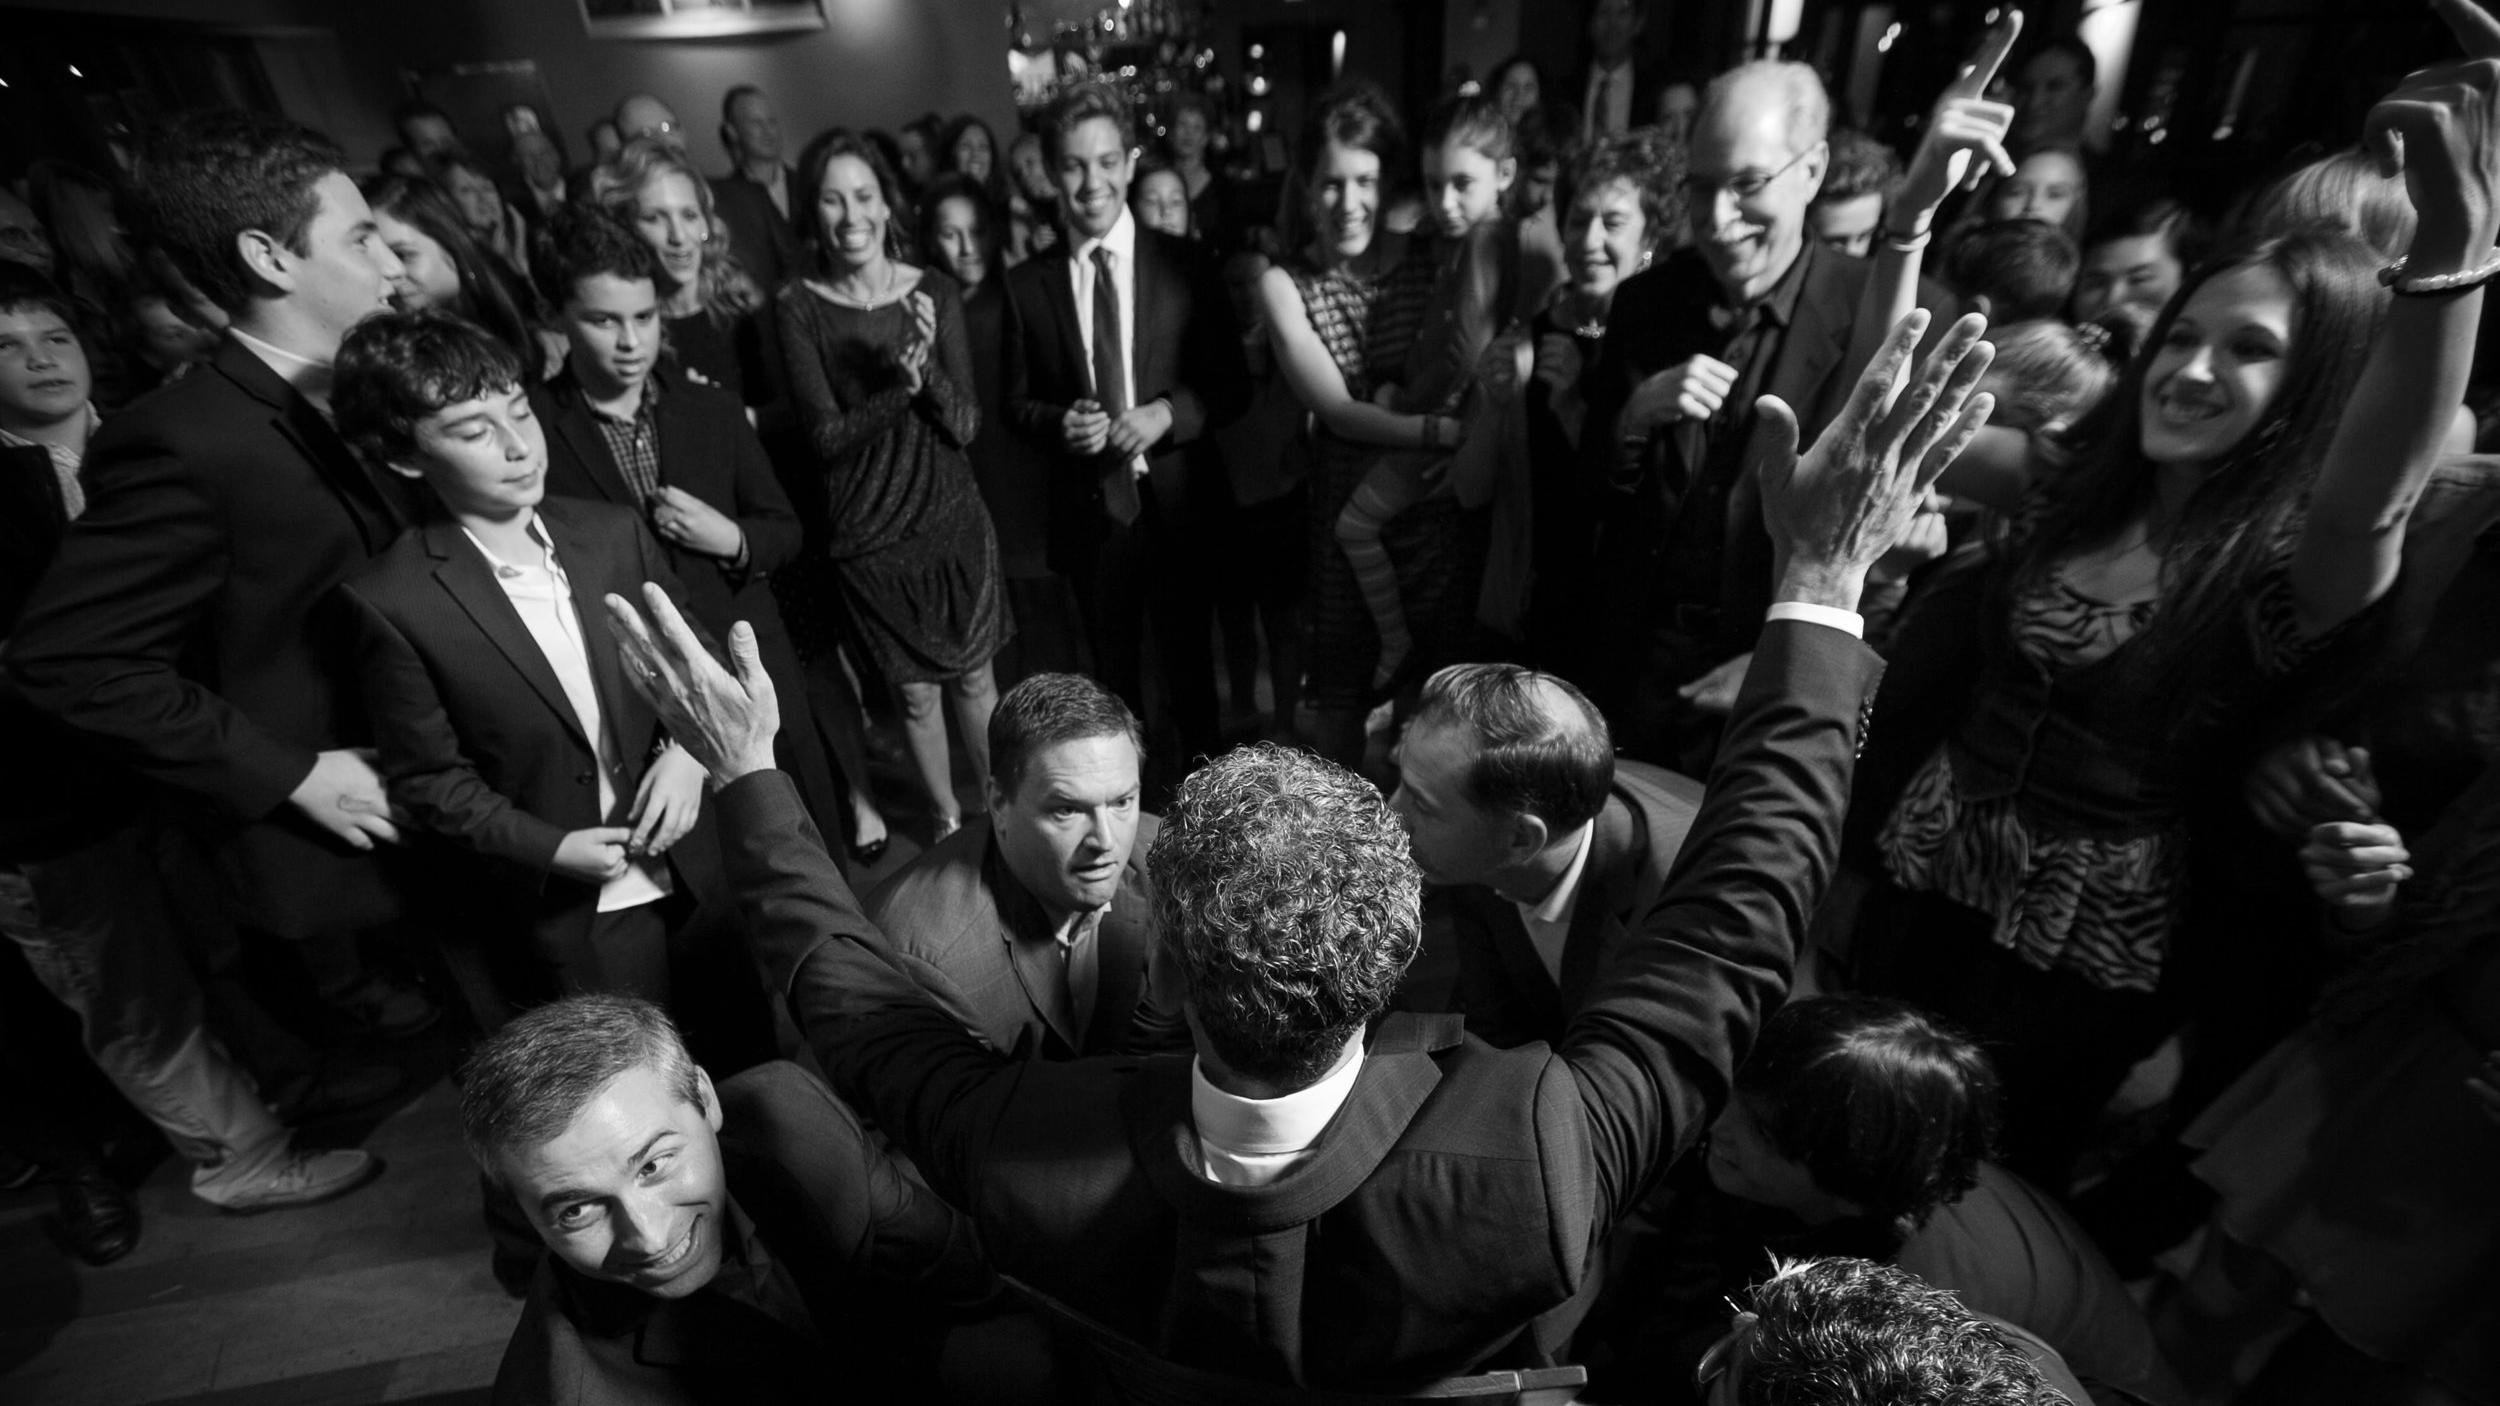 00282_20141115193004_San_Francisco_Wedding_Photographer_Sees_The_Day.jpg